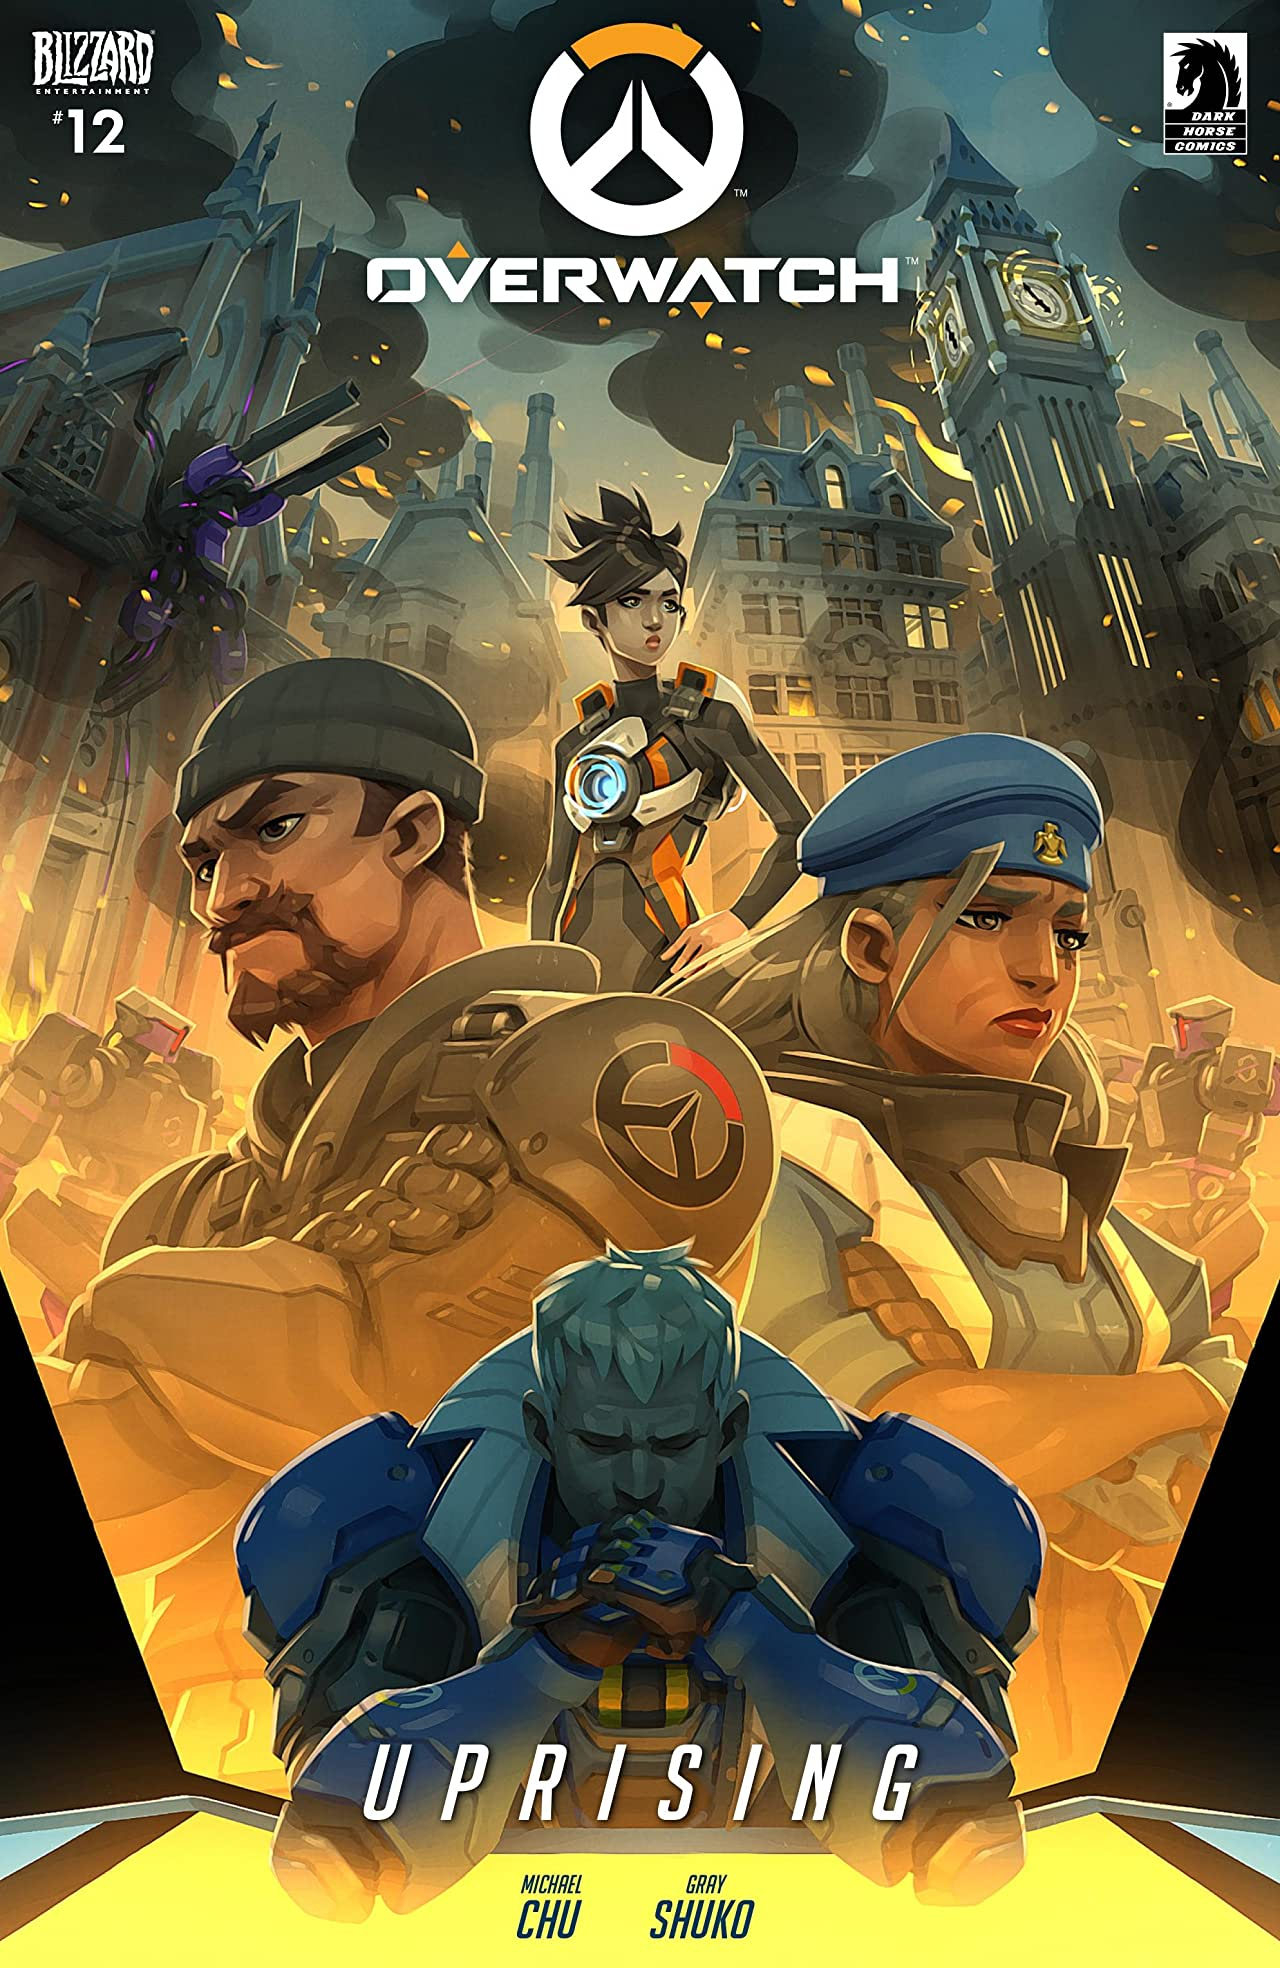 Overwatch #12